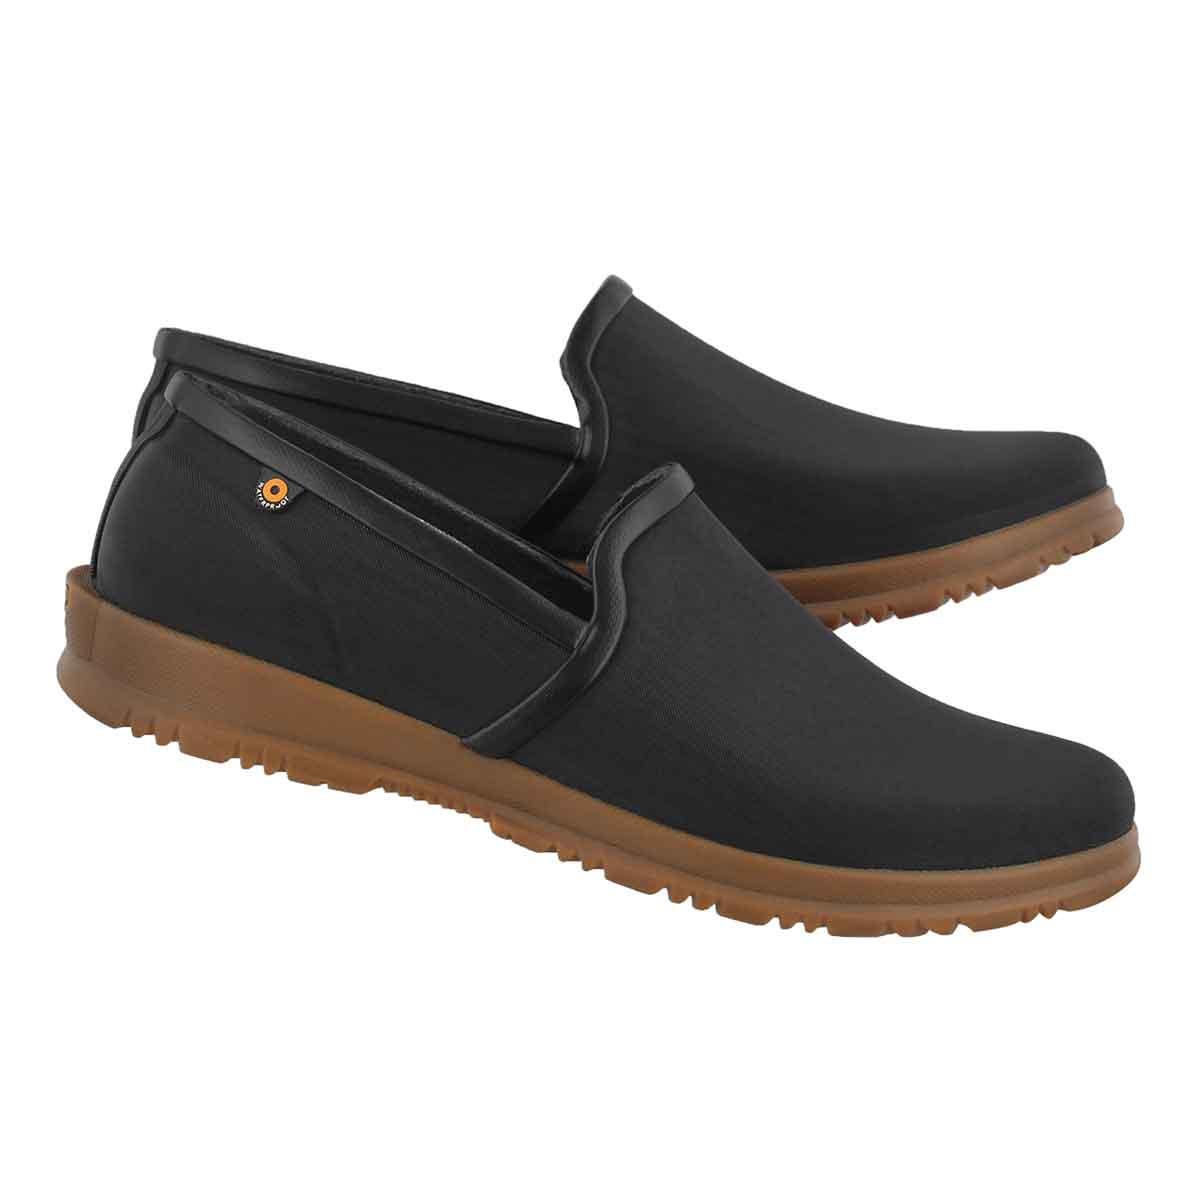 Lds Sweetpea black waterproof slip on